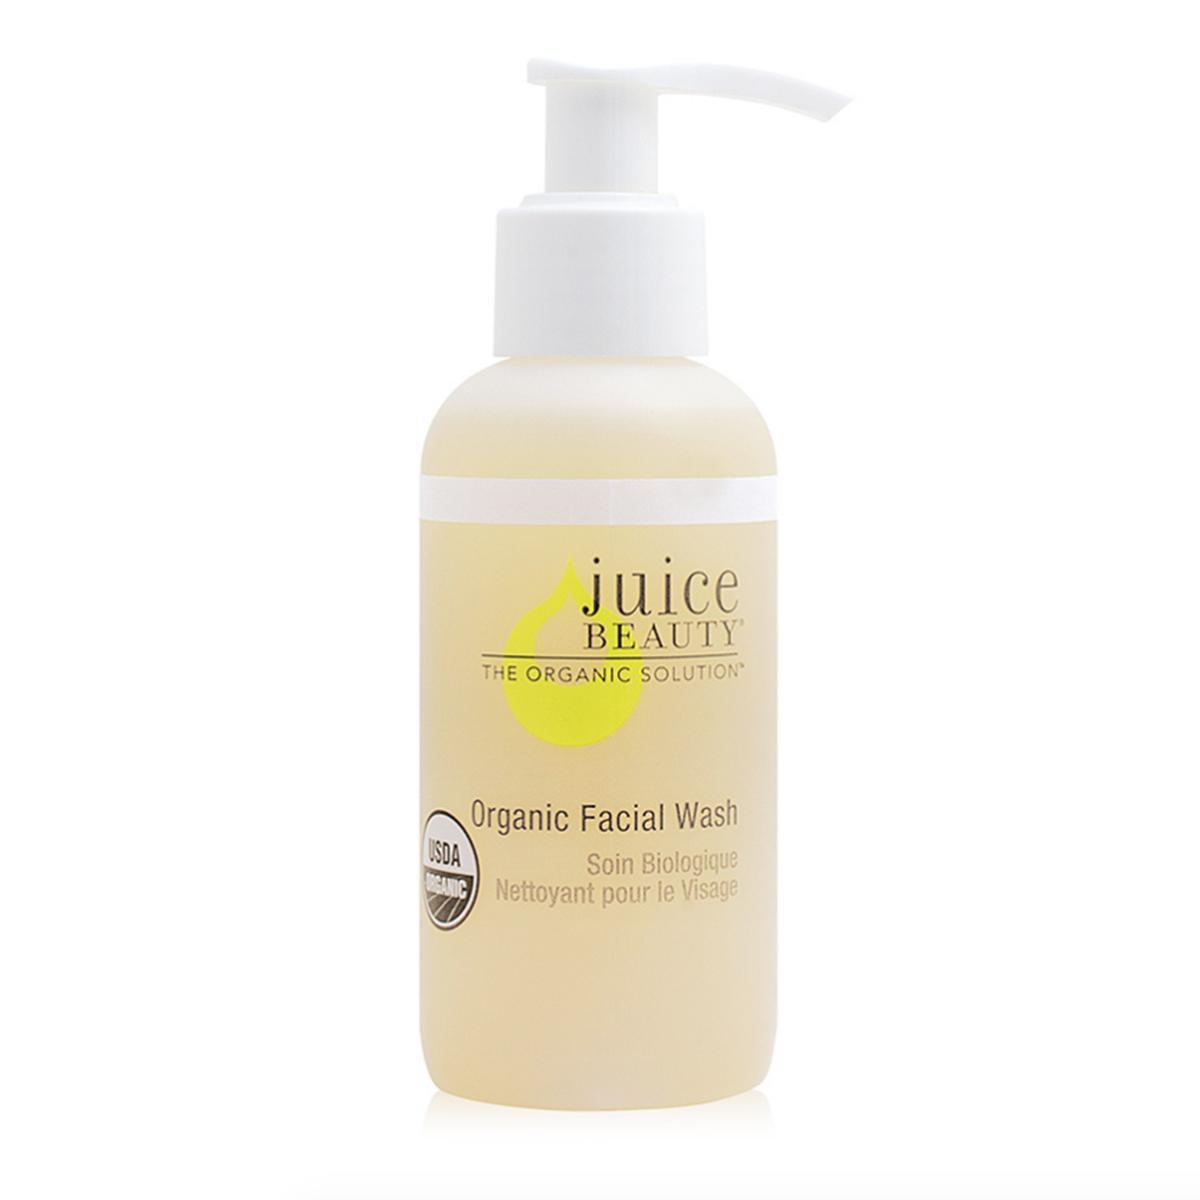 Juice Beauty Cleanser